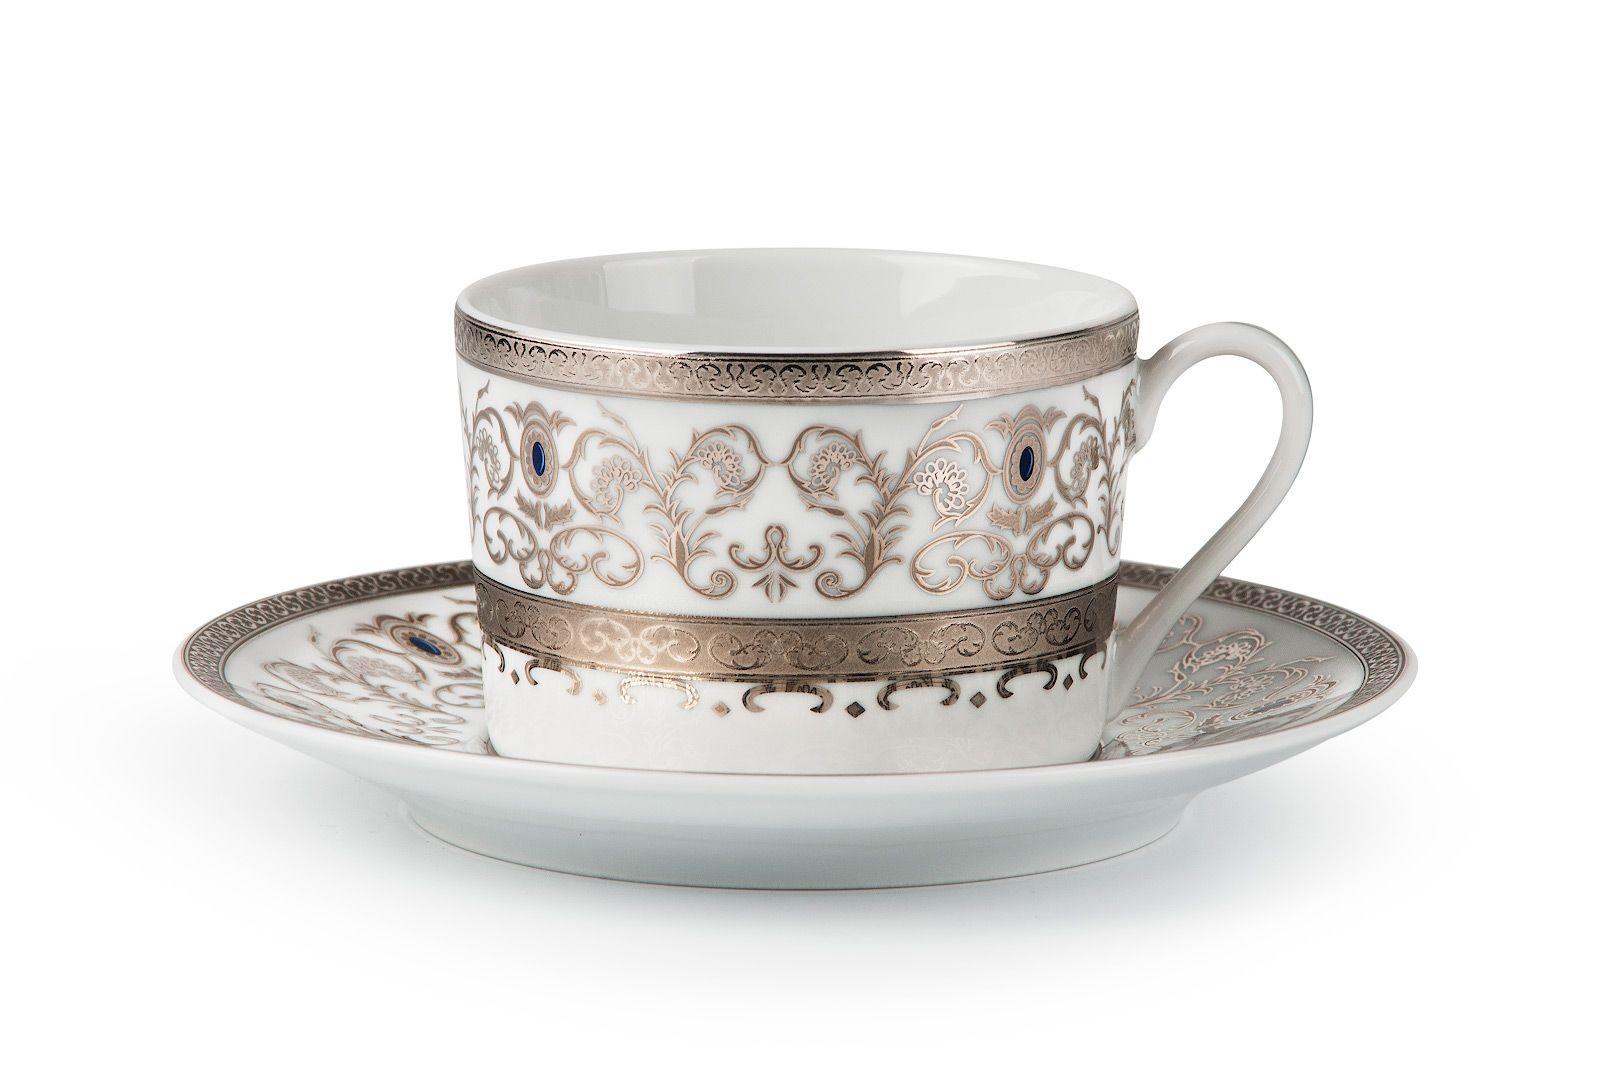 Фарфоровый набор чайных пар на 6 персон MIMOSA MIMOSA